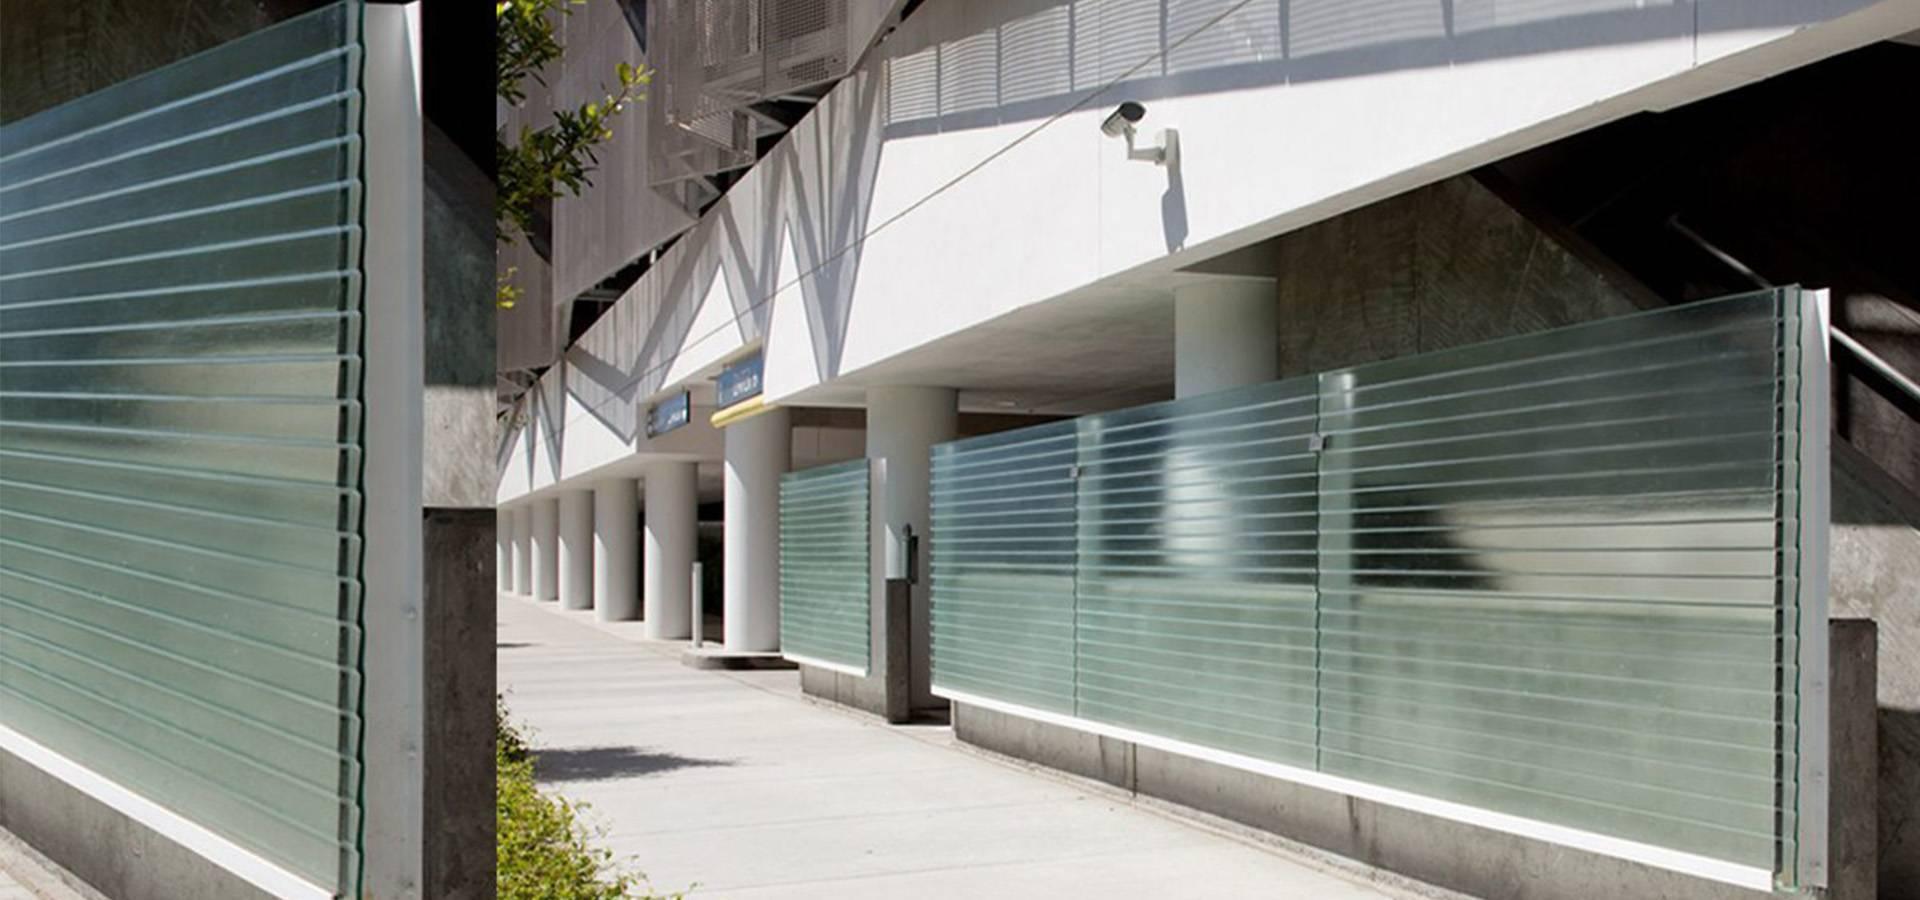 Outdoor aqua clear Porch glass partition